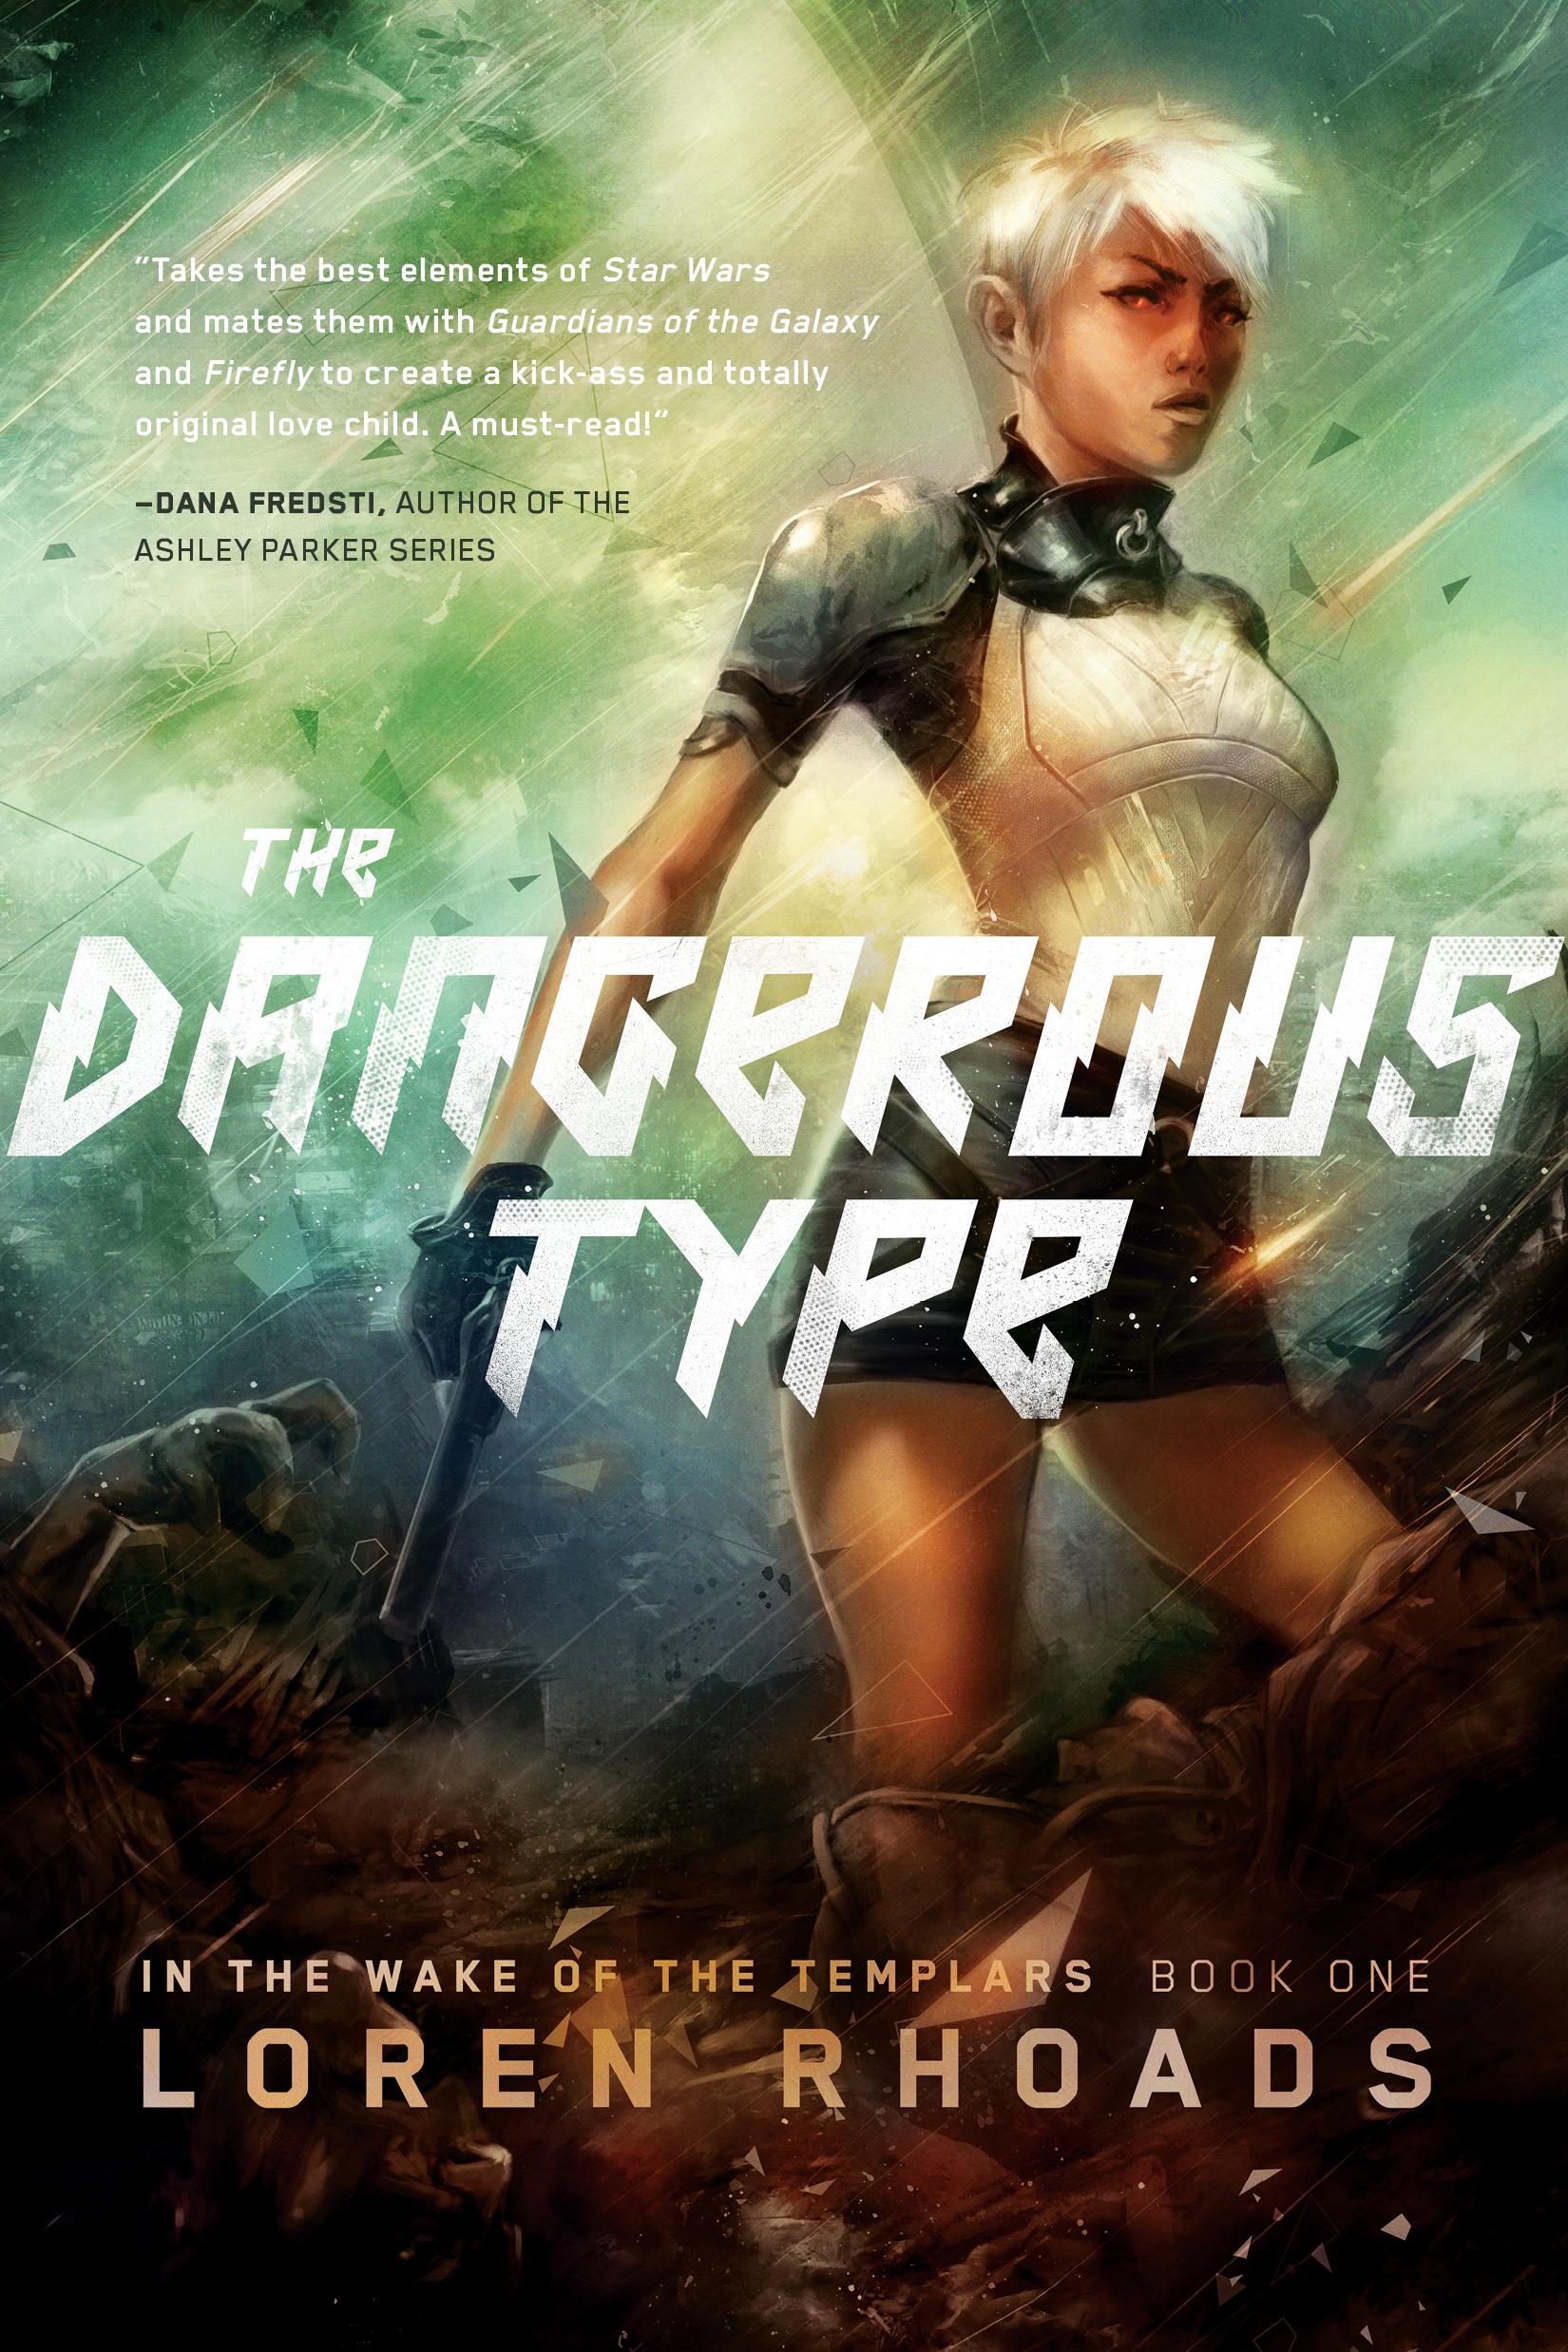 Dangerous Type